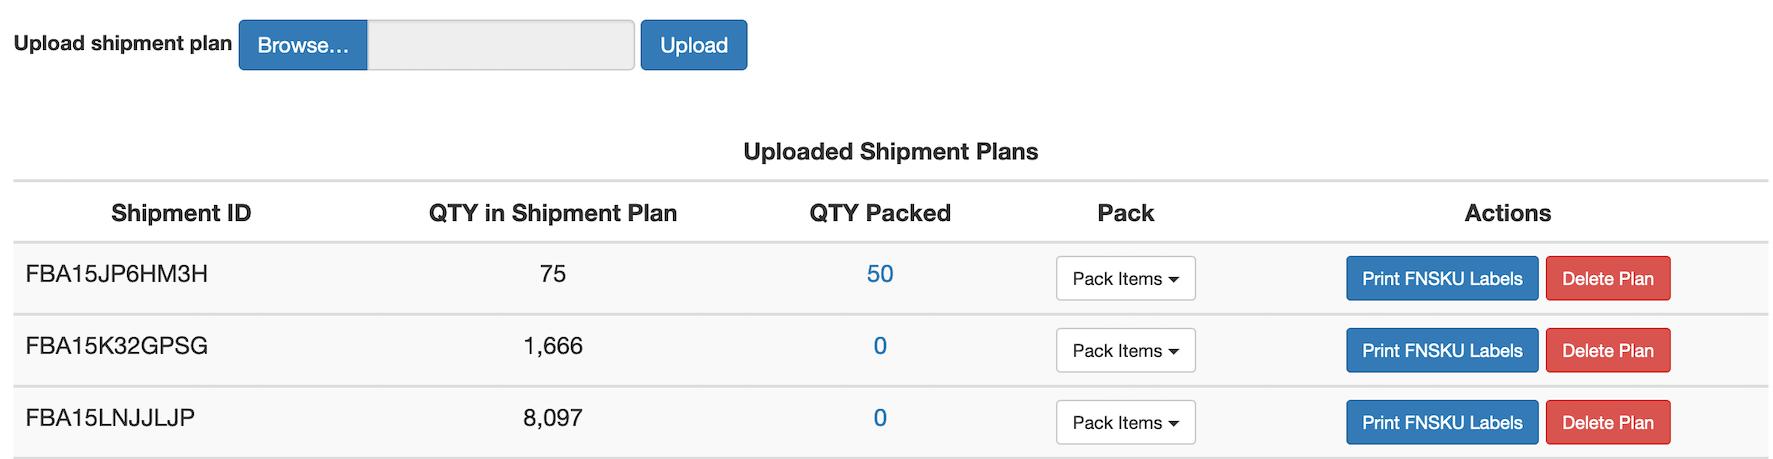 Shipment Plans